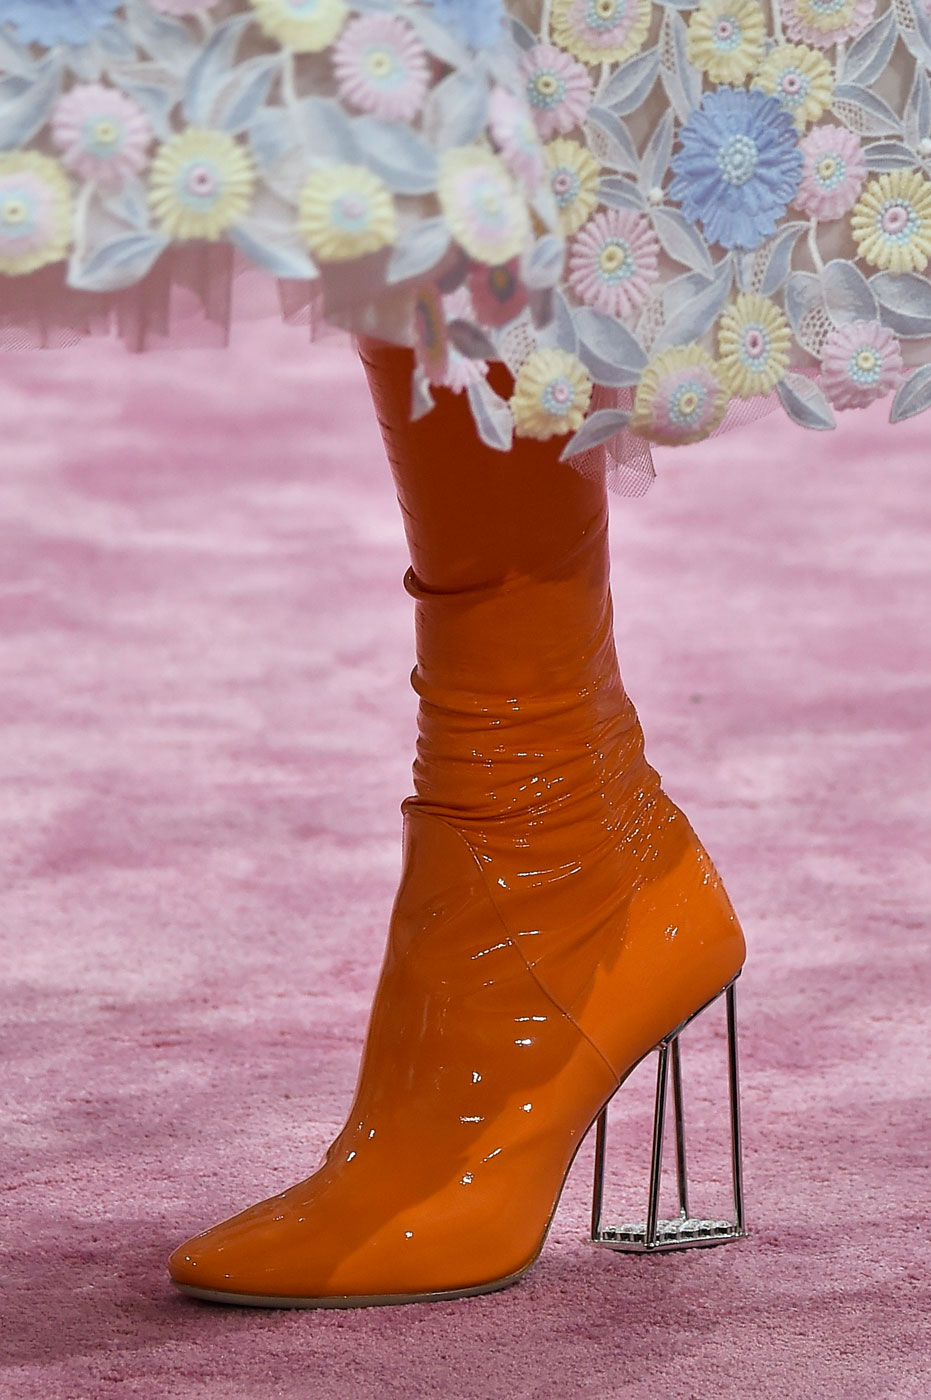 Christian-Dior-fashion-runway-show-close-ups-haute-couture-paris-spring-summer-2015-the-impression-162